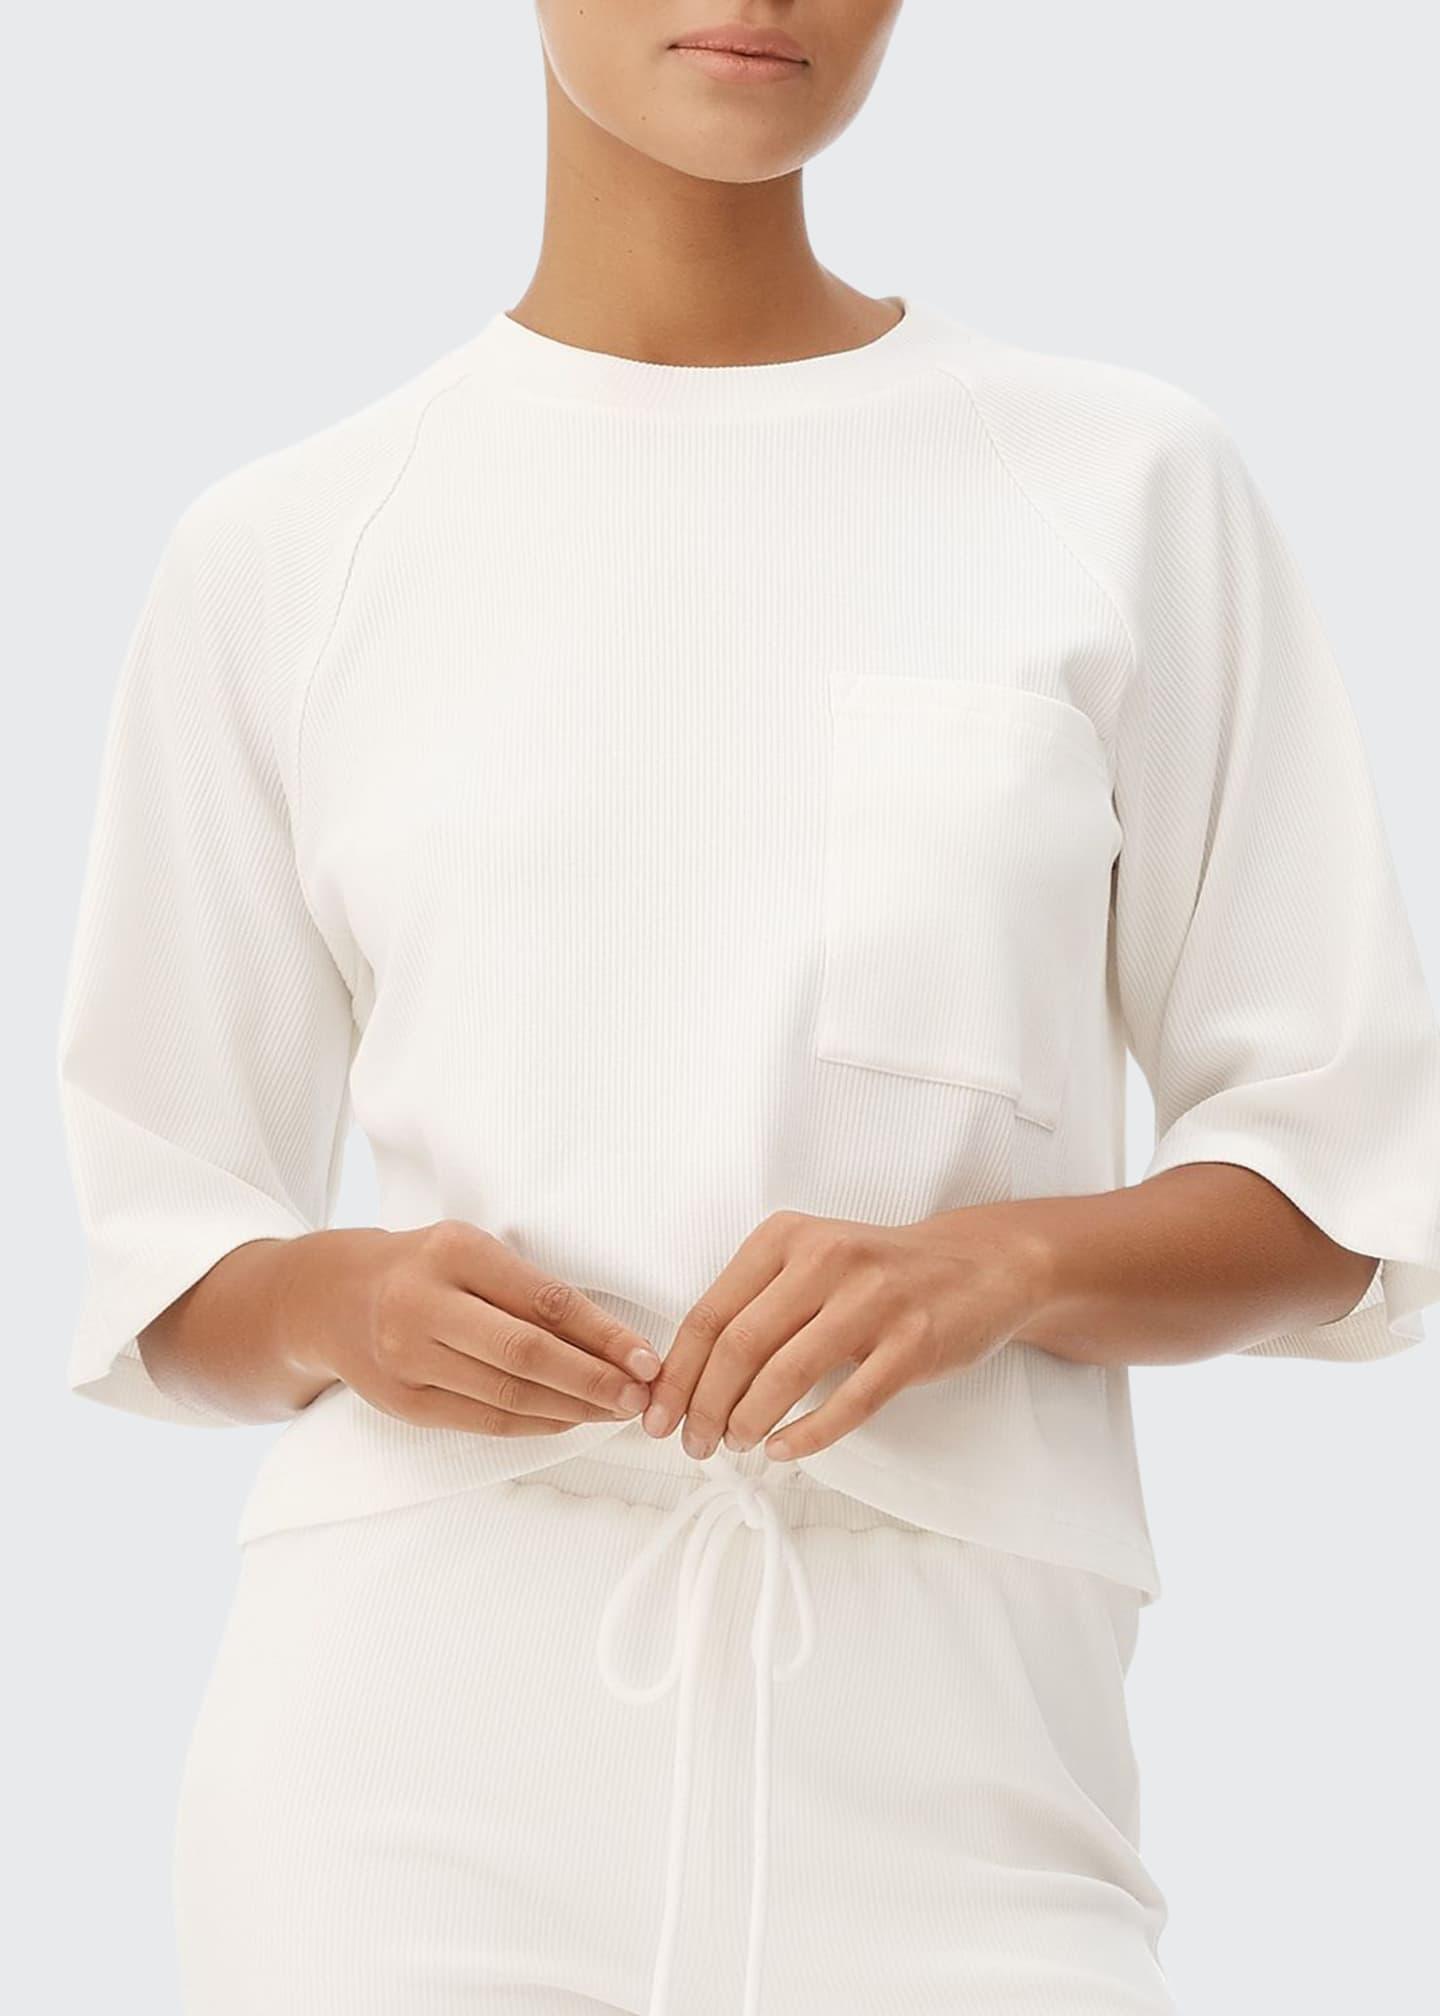 All Fenix Lyla Elbow-Sleeved Ribbed Tee